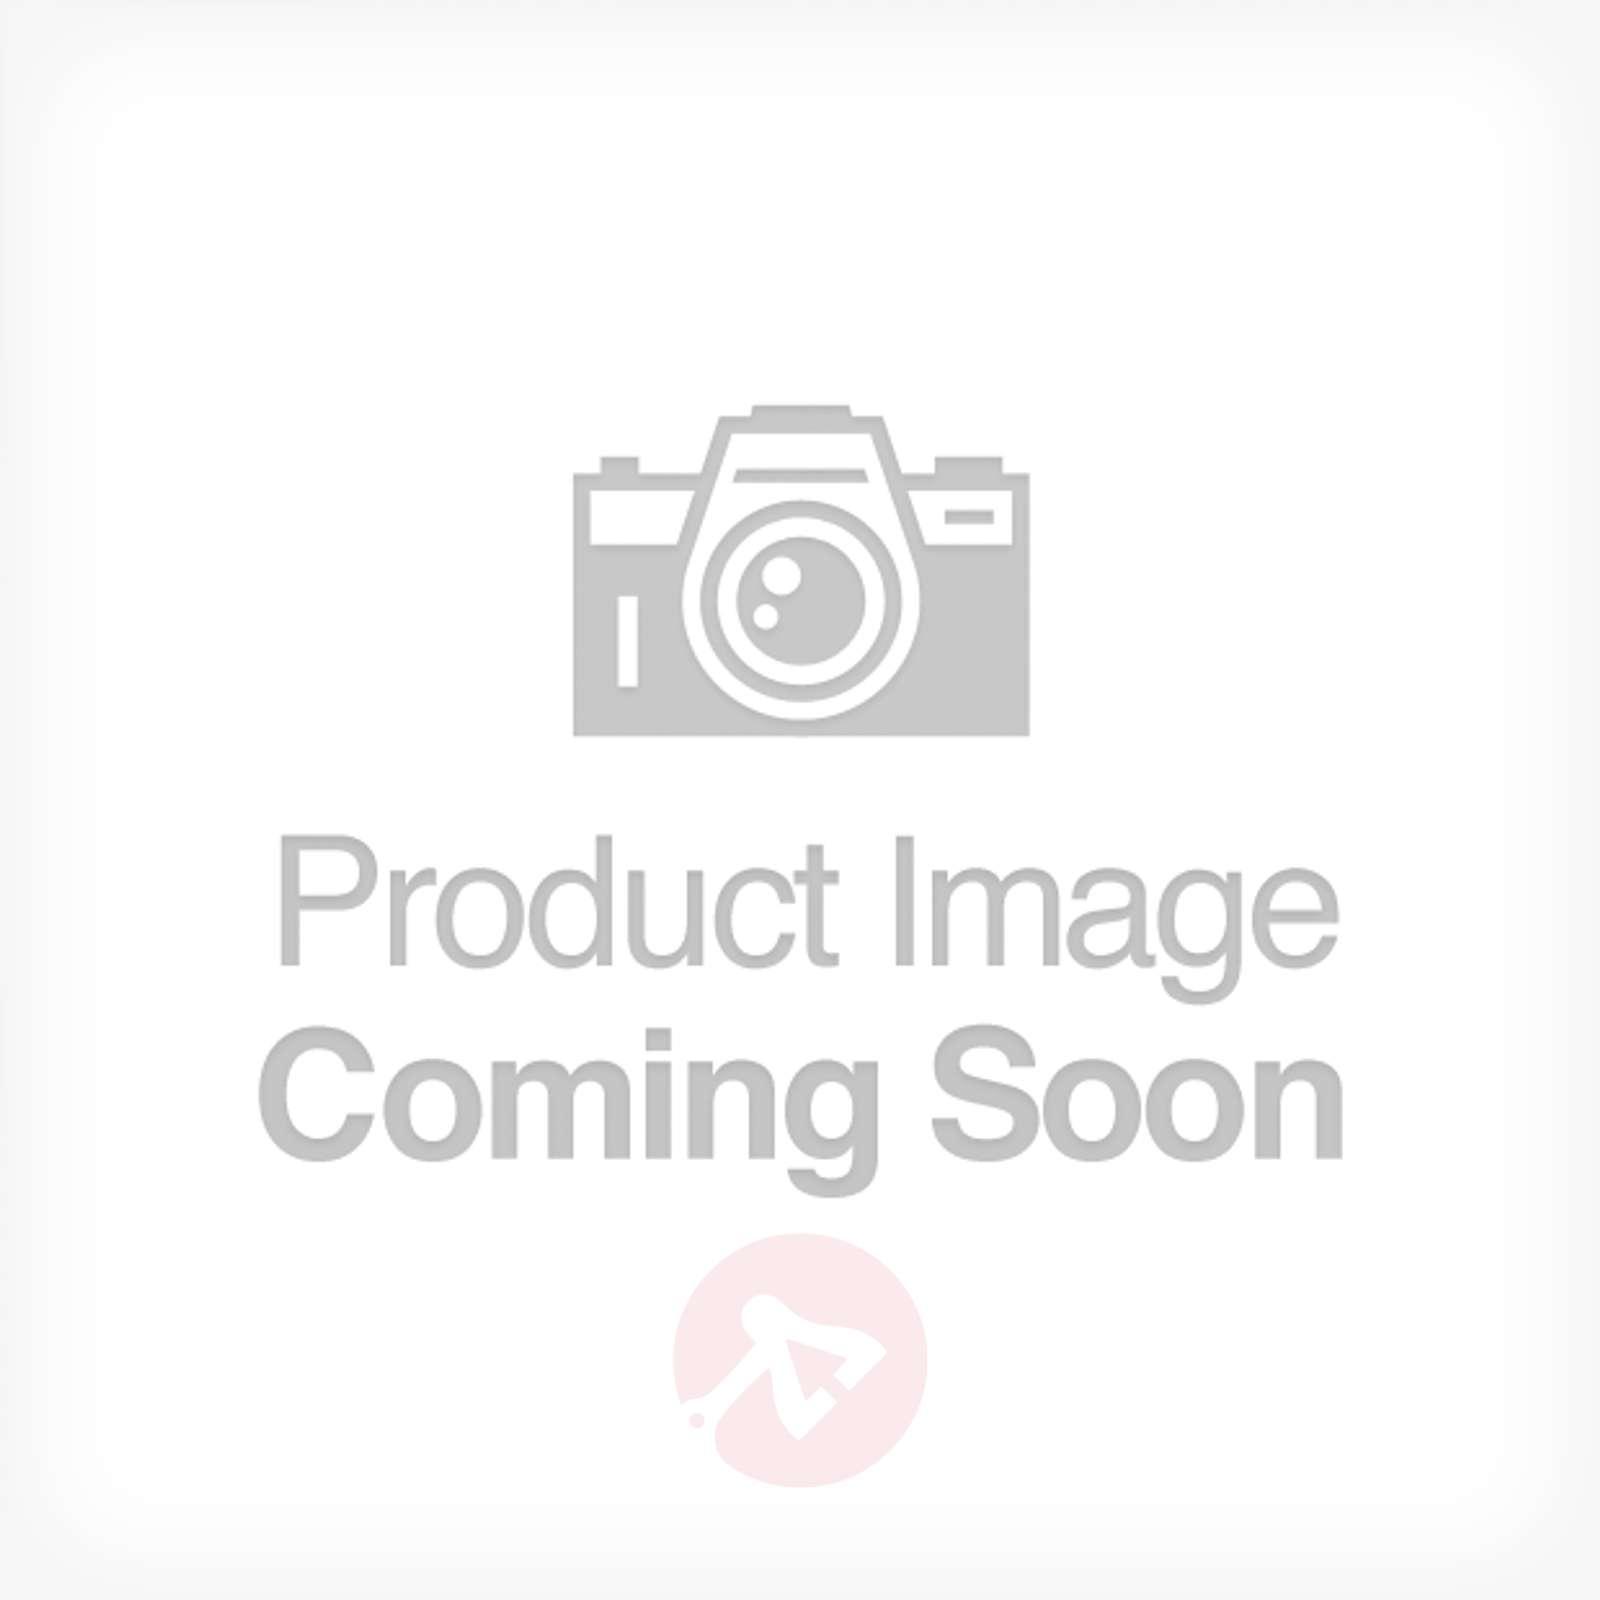 VERTEX elegant cosmetic pedestal mirror-2504206X-01